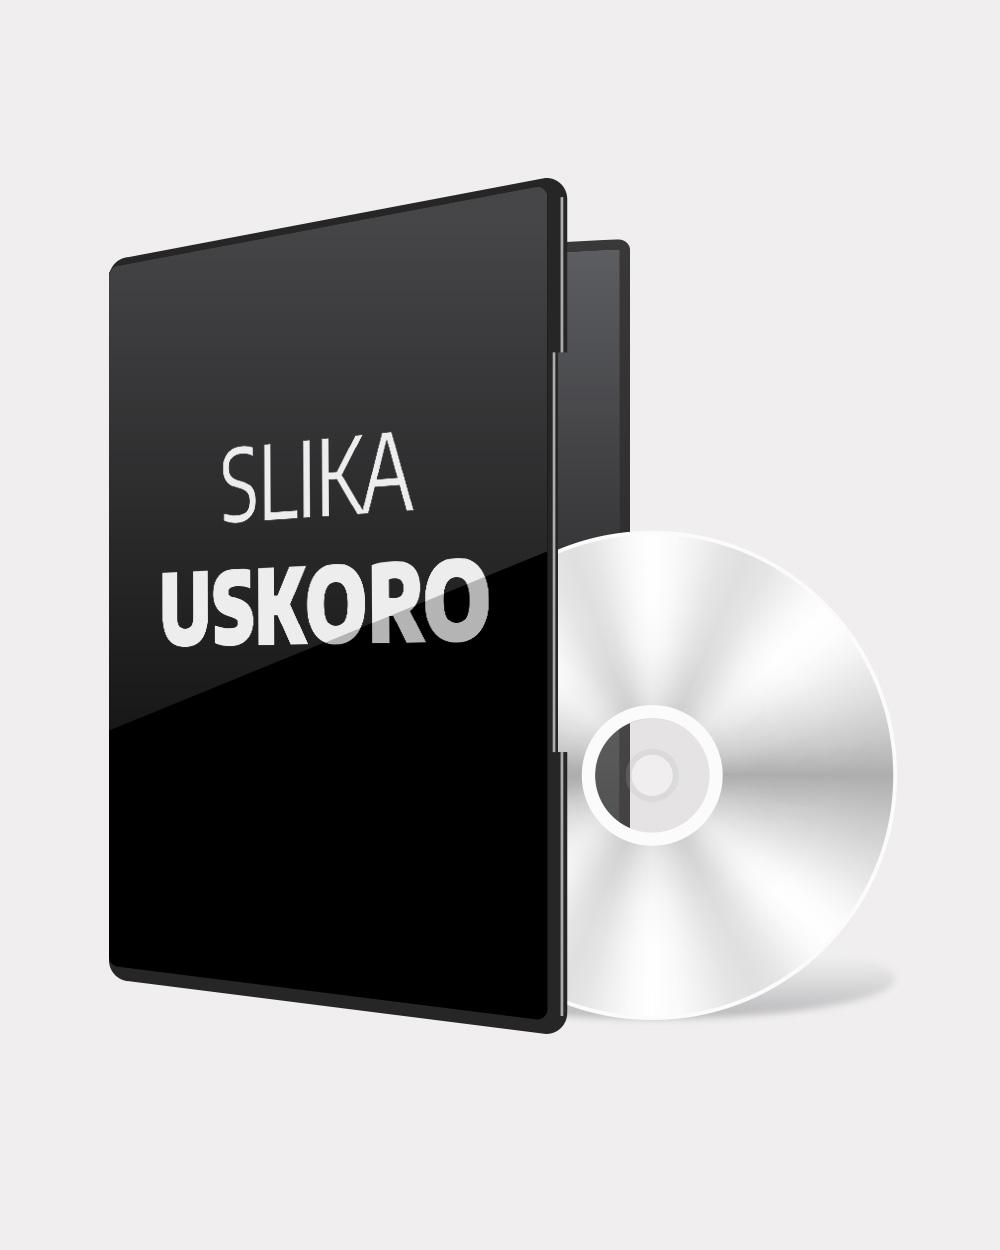 PS3 A Realm Reborn Final Fantasy XIV Online